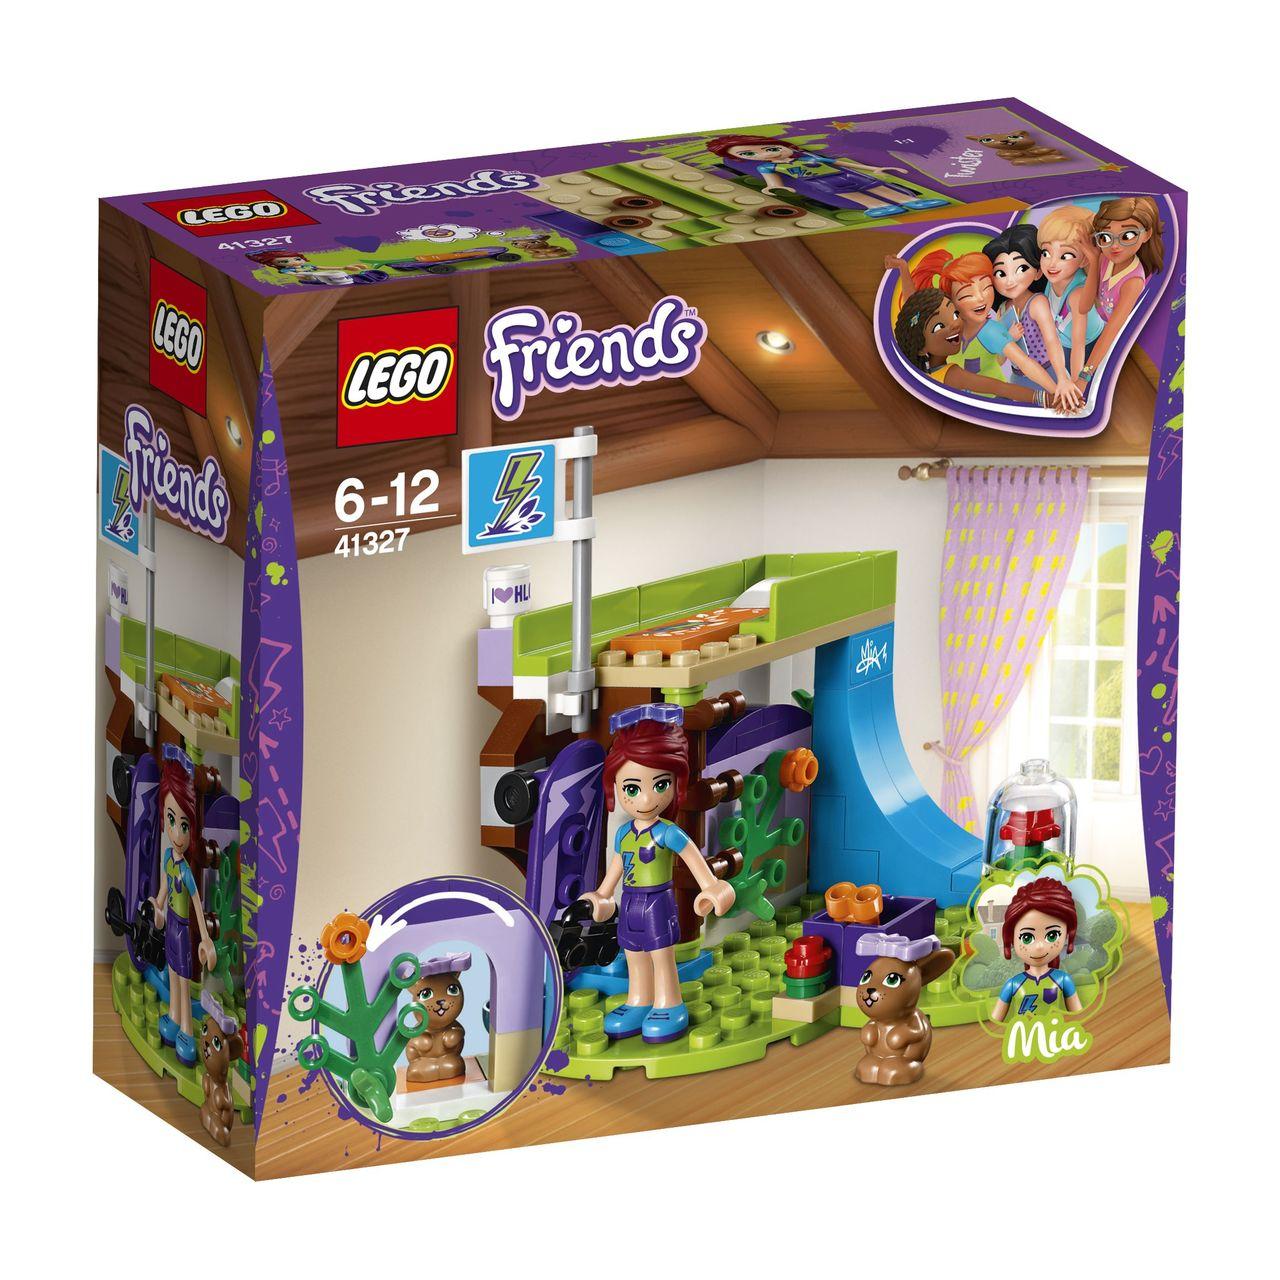 Lego Friends Mias Bedroom 41327 Toymate